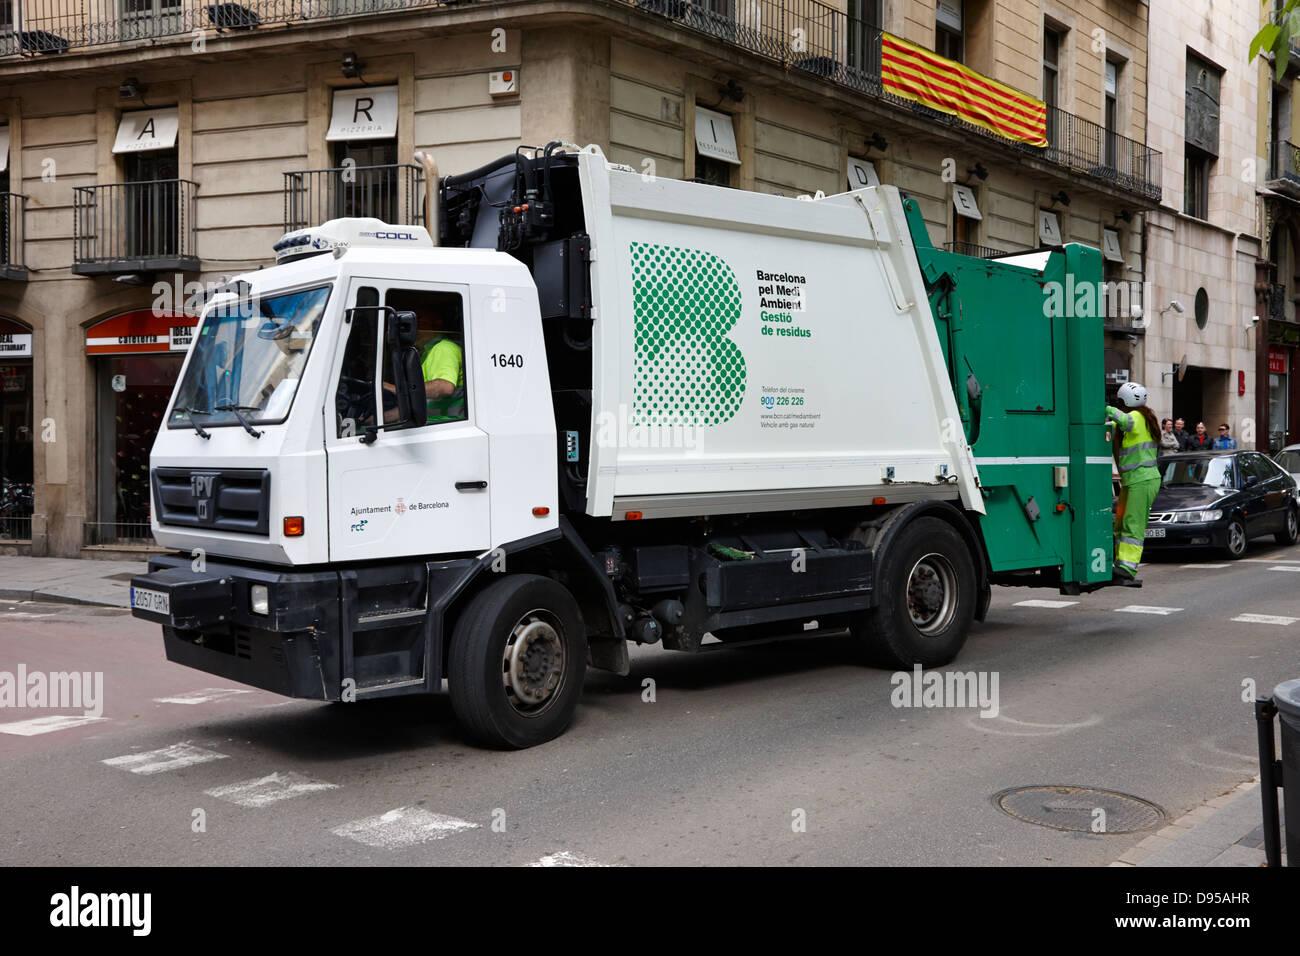 Barcelona pel medi ambient gestio de residus residuos vehículo cataluña españa Imagen De Stock